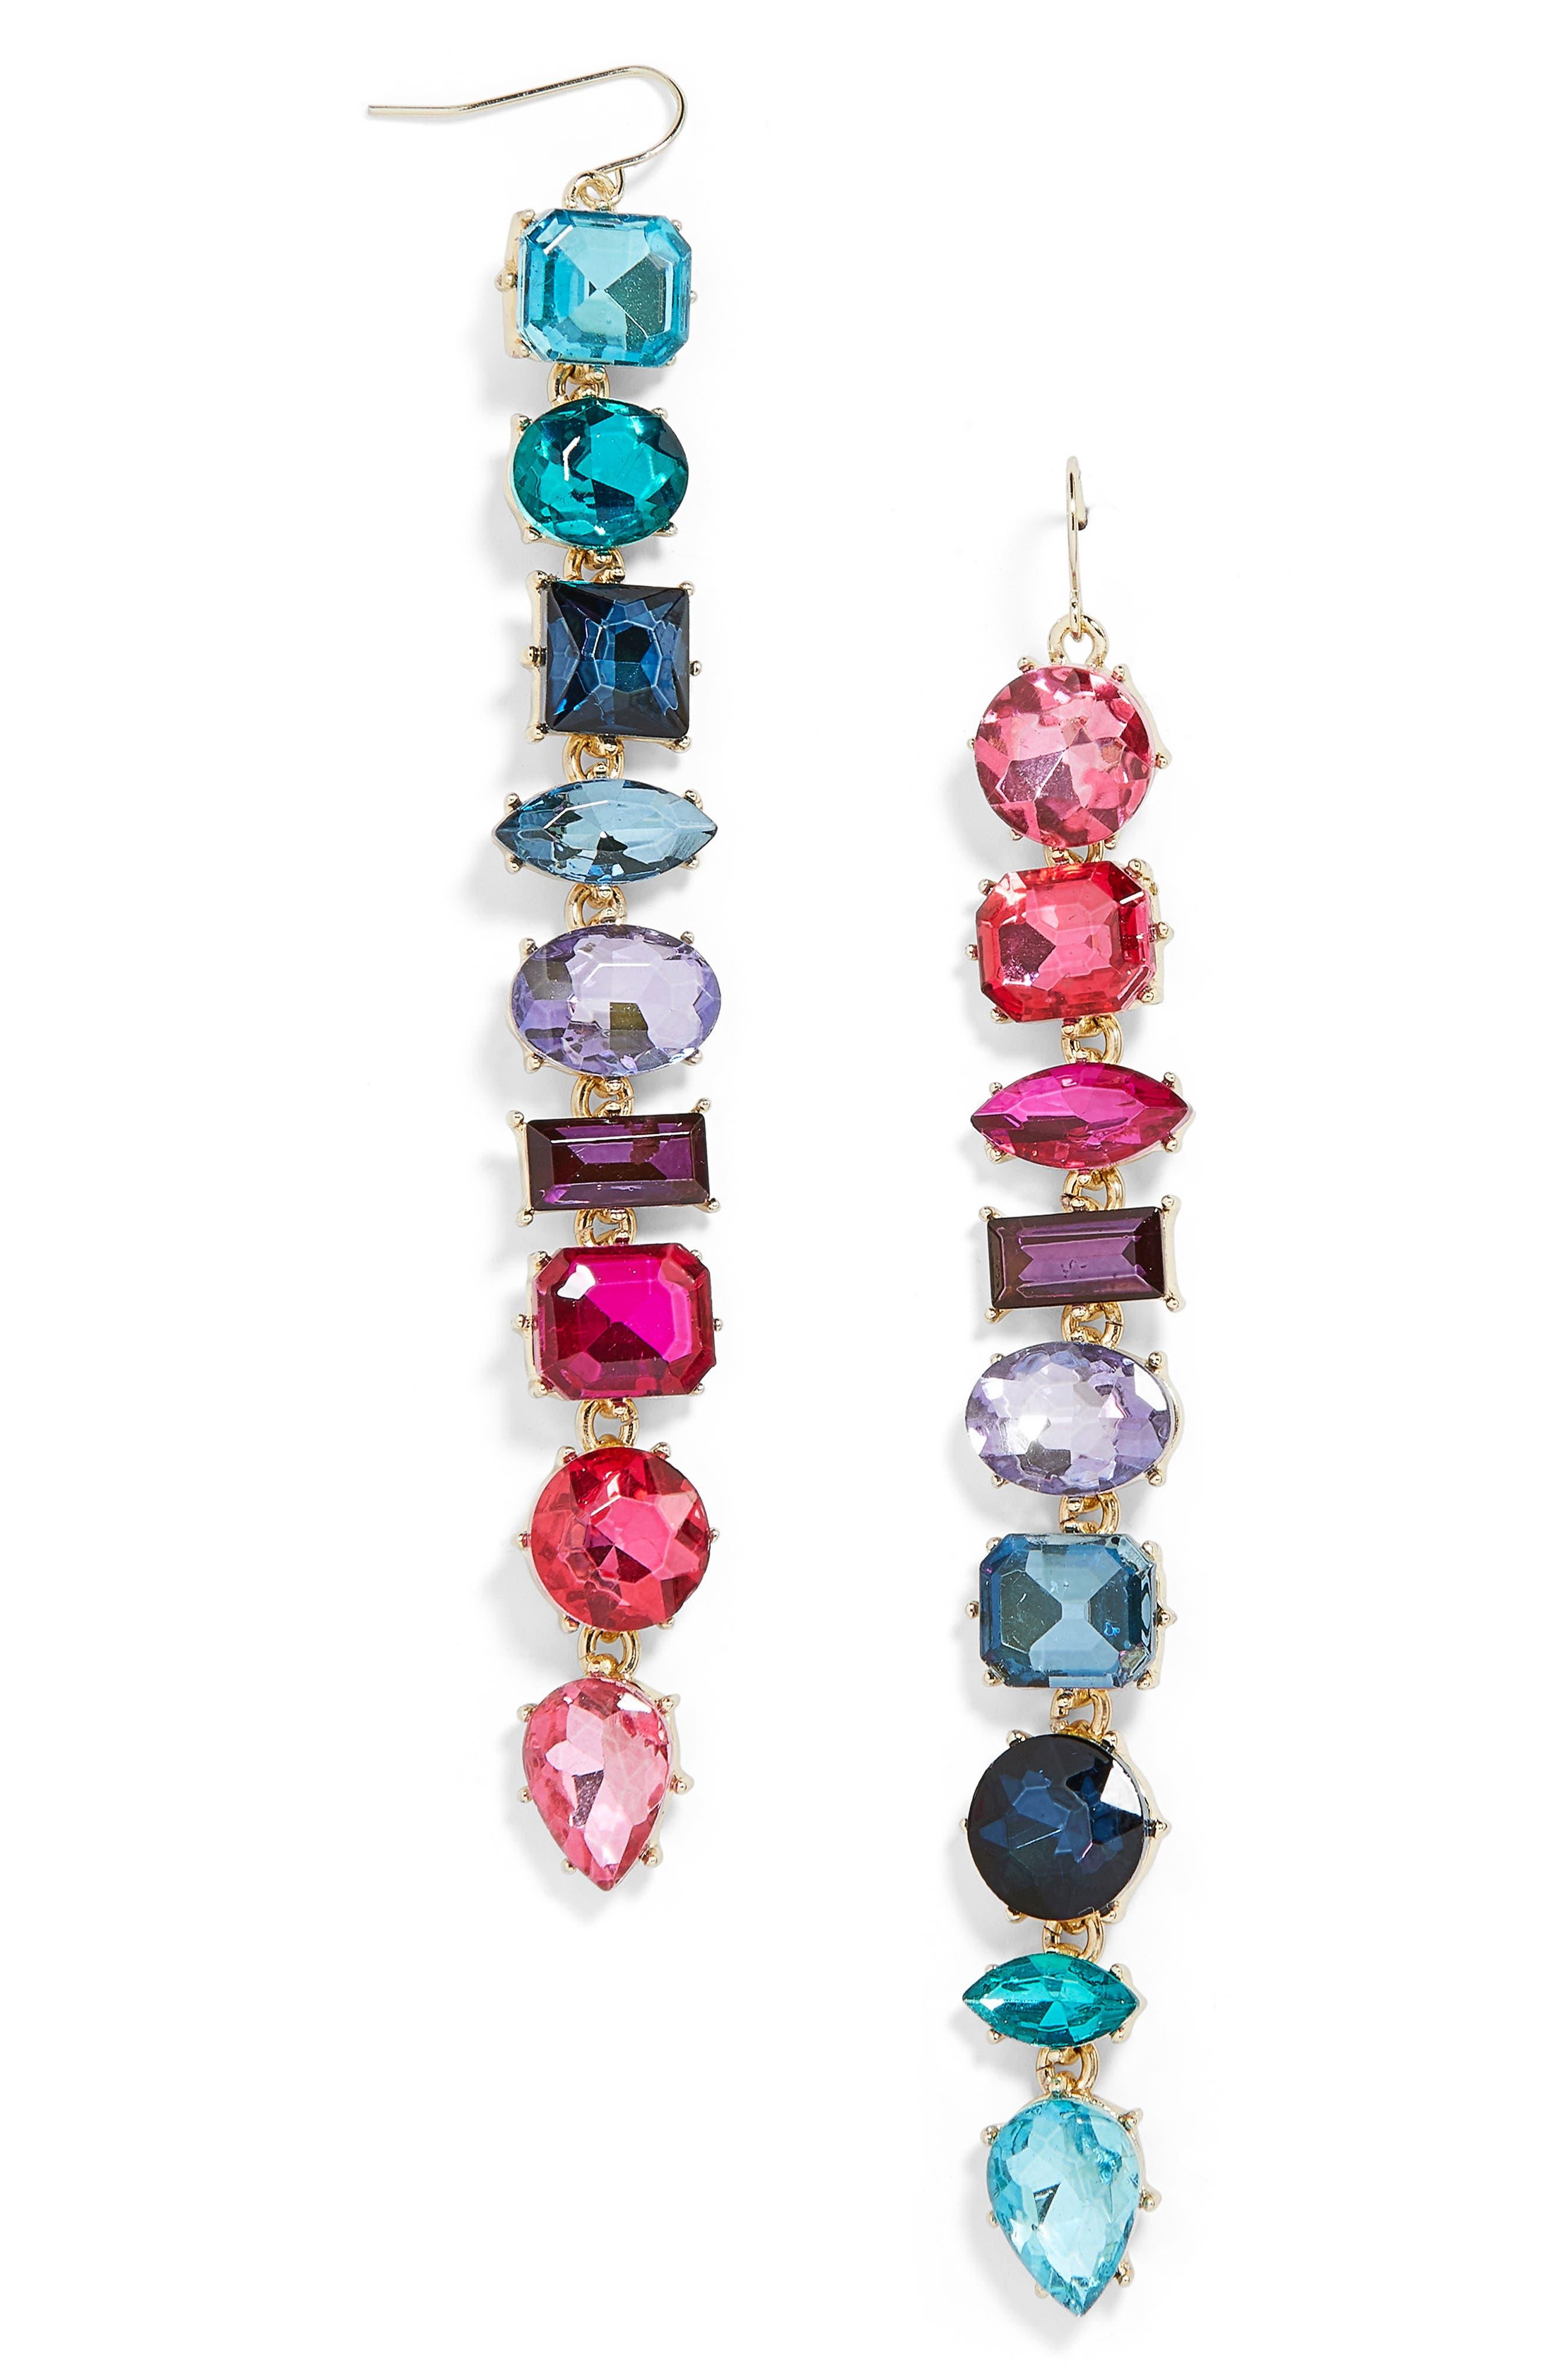 x Micaela Erlanger Date Night Mismatched Drop Earrings,                             Main thumbnail 1, color,                             MULTI/ GOLD